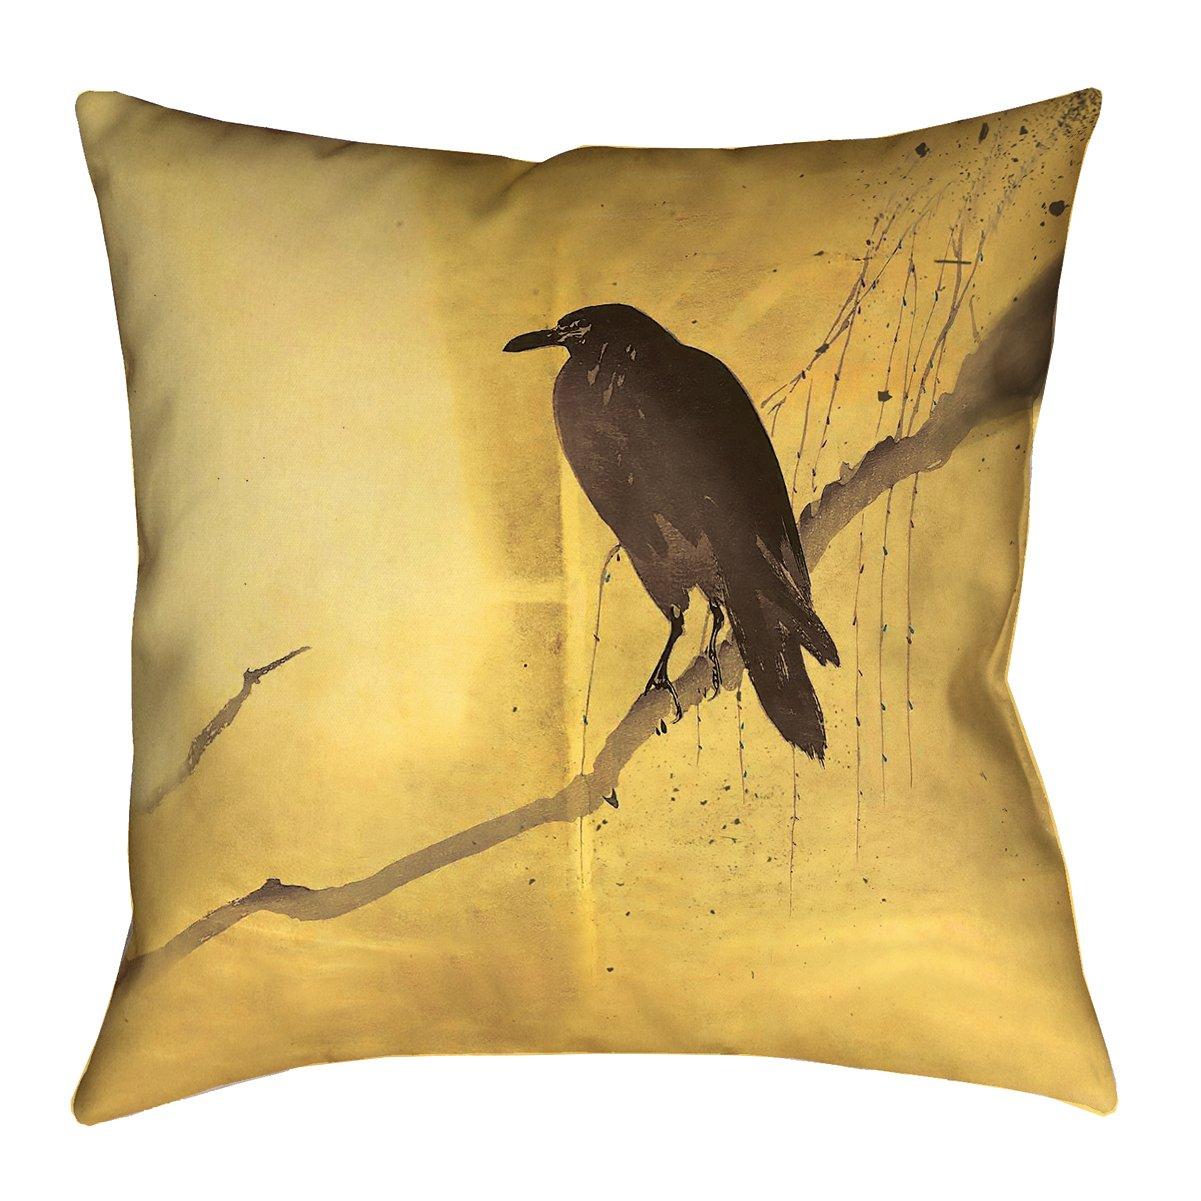 ArtVerse Katelyn Smith 18 x 18 Indoor//Outdoor UV Properties-Waterproof and Mildew Proof Yellow Crow and Willow Pillow